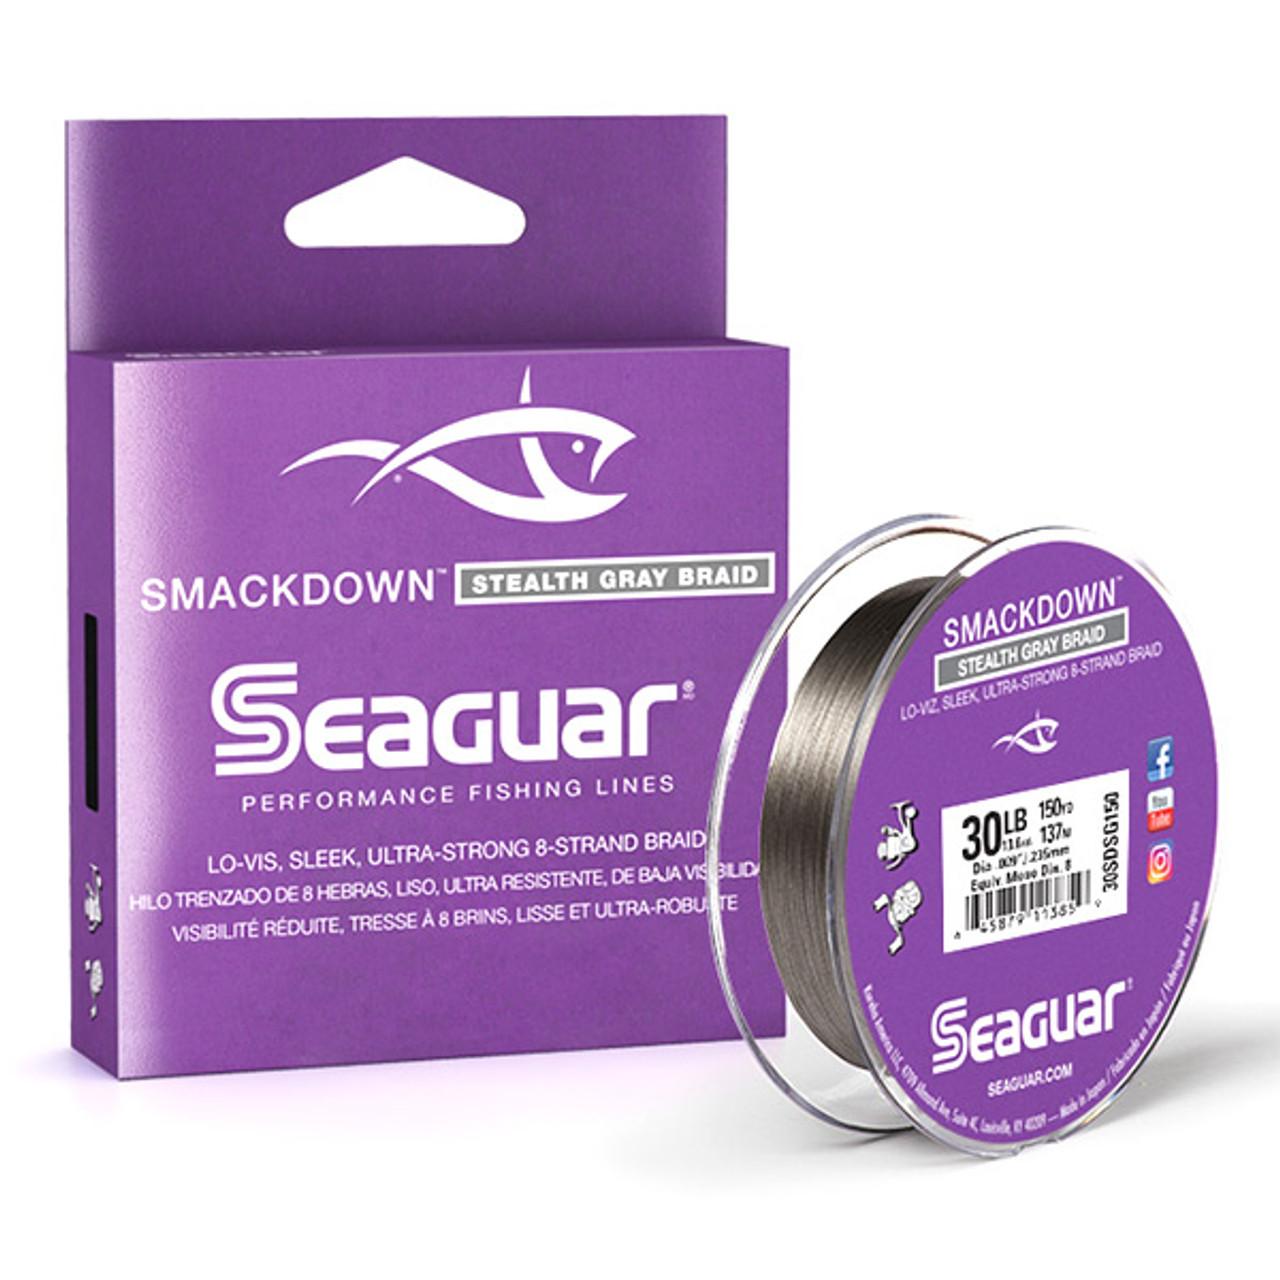 Seaguar Smackdown Stealth Gray